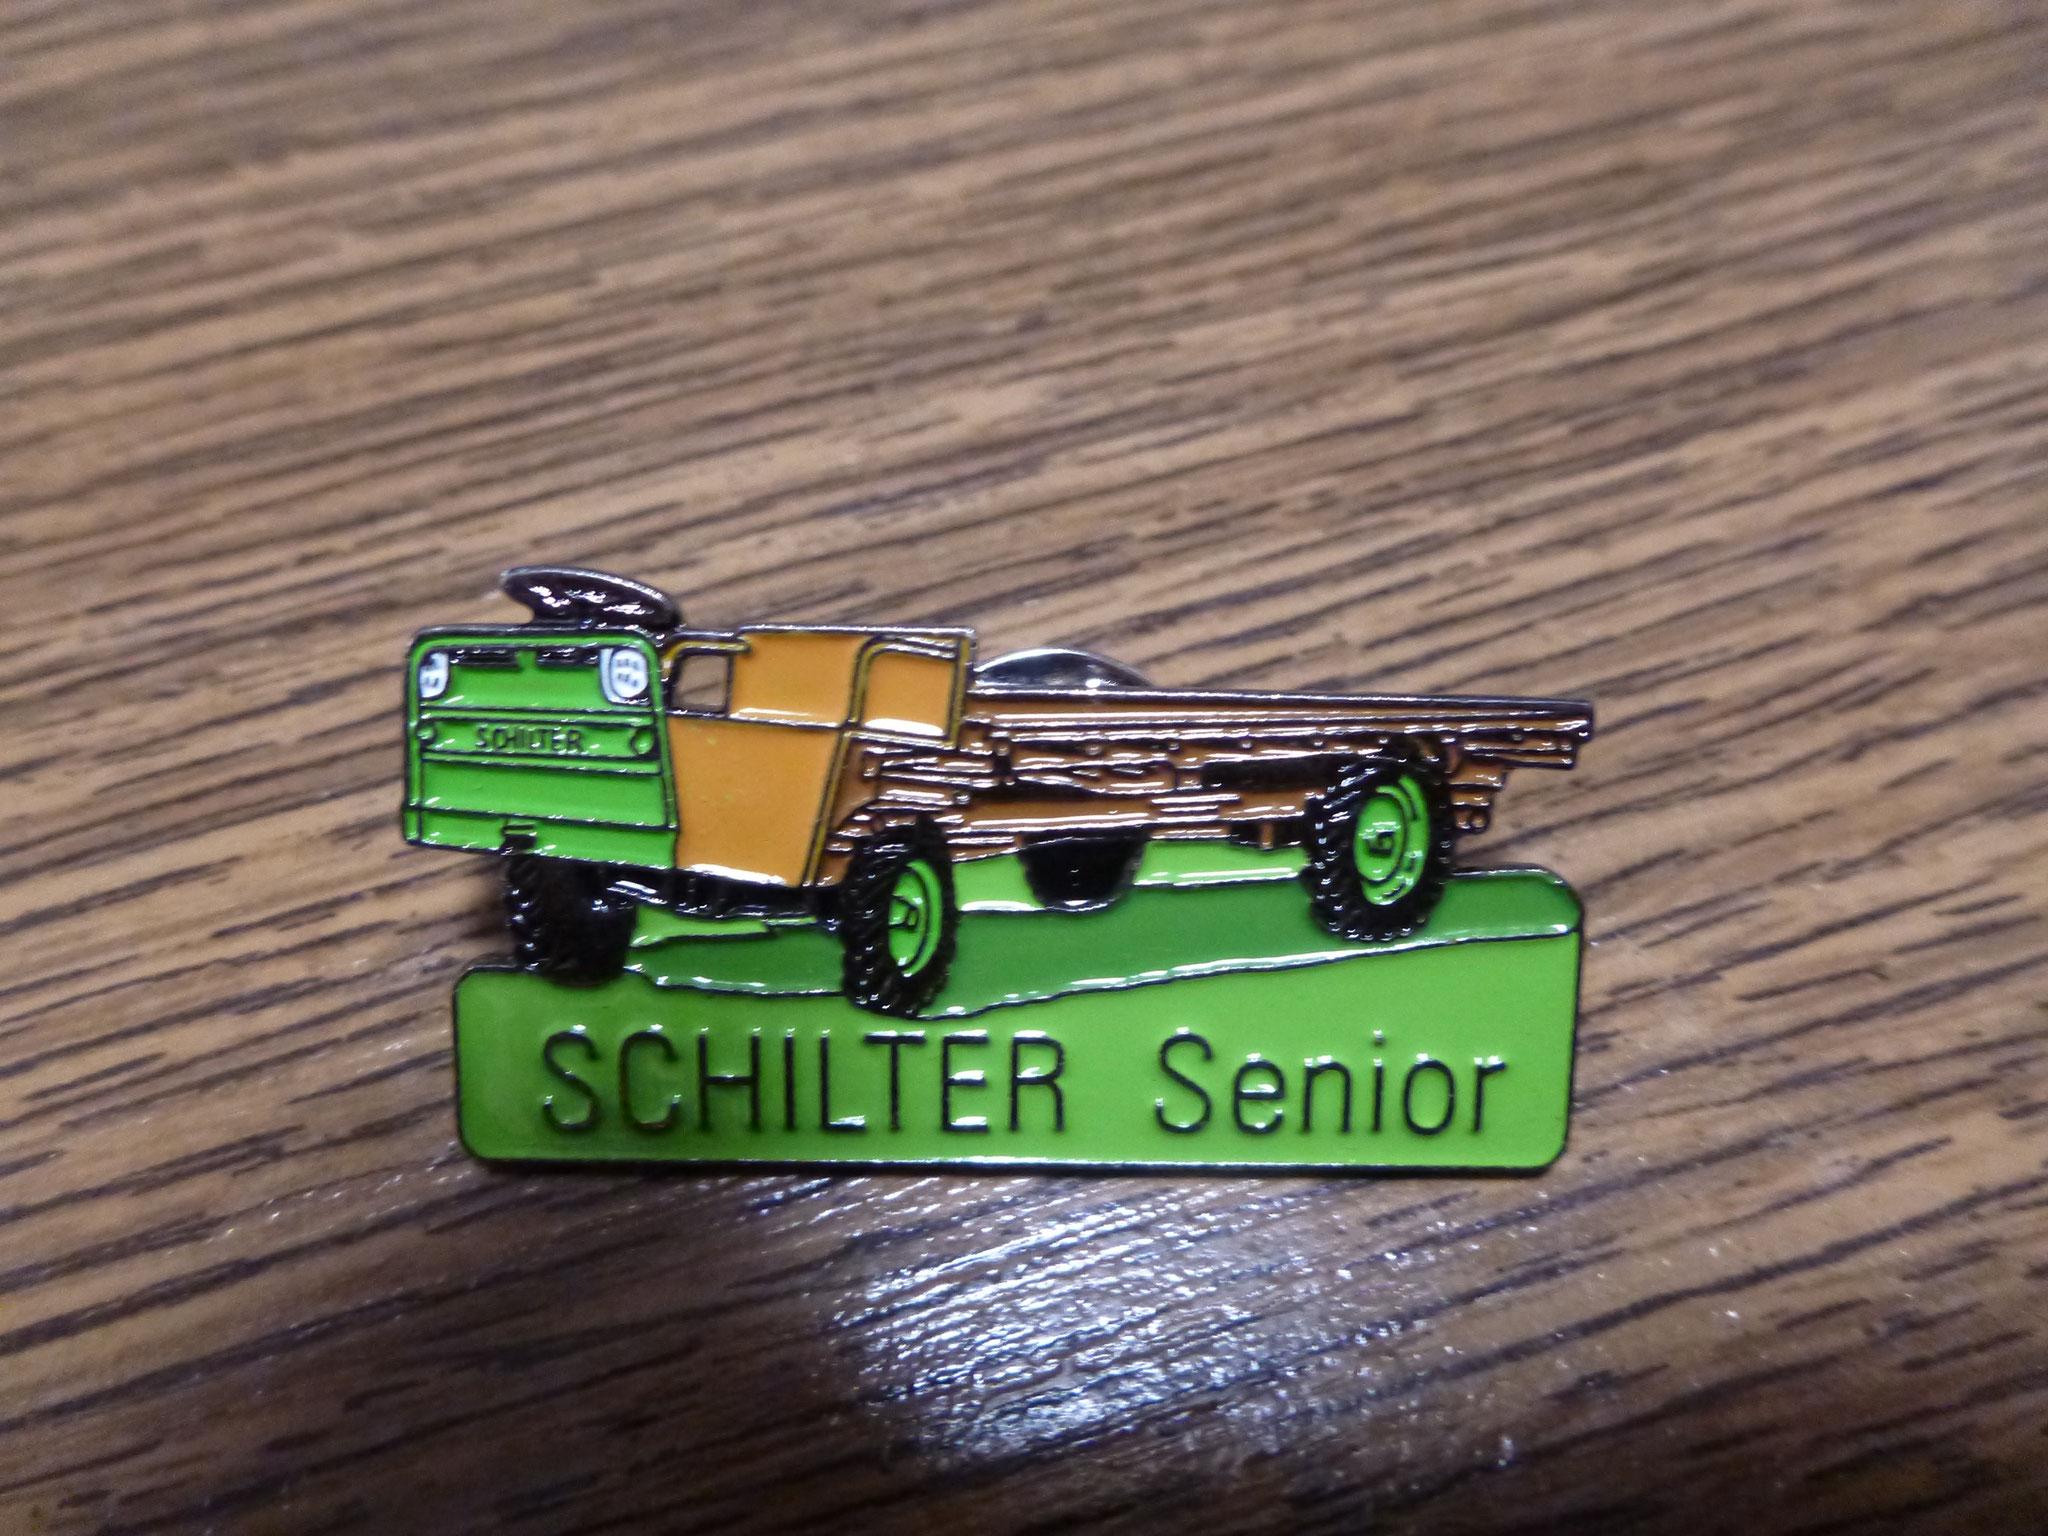 Pin Schilter senior